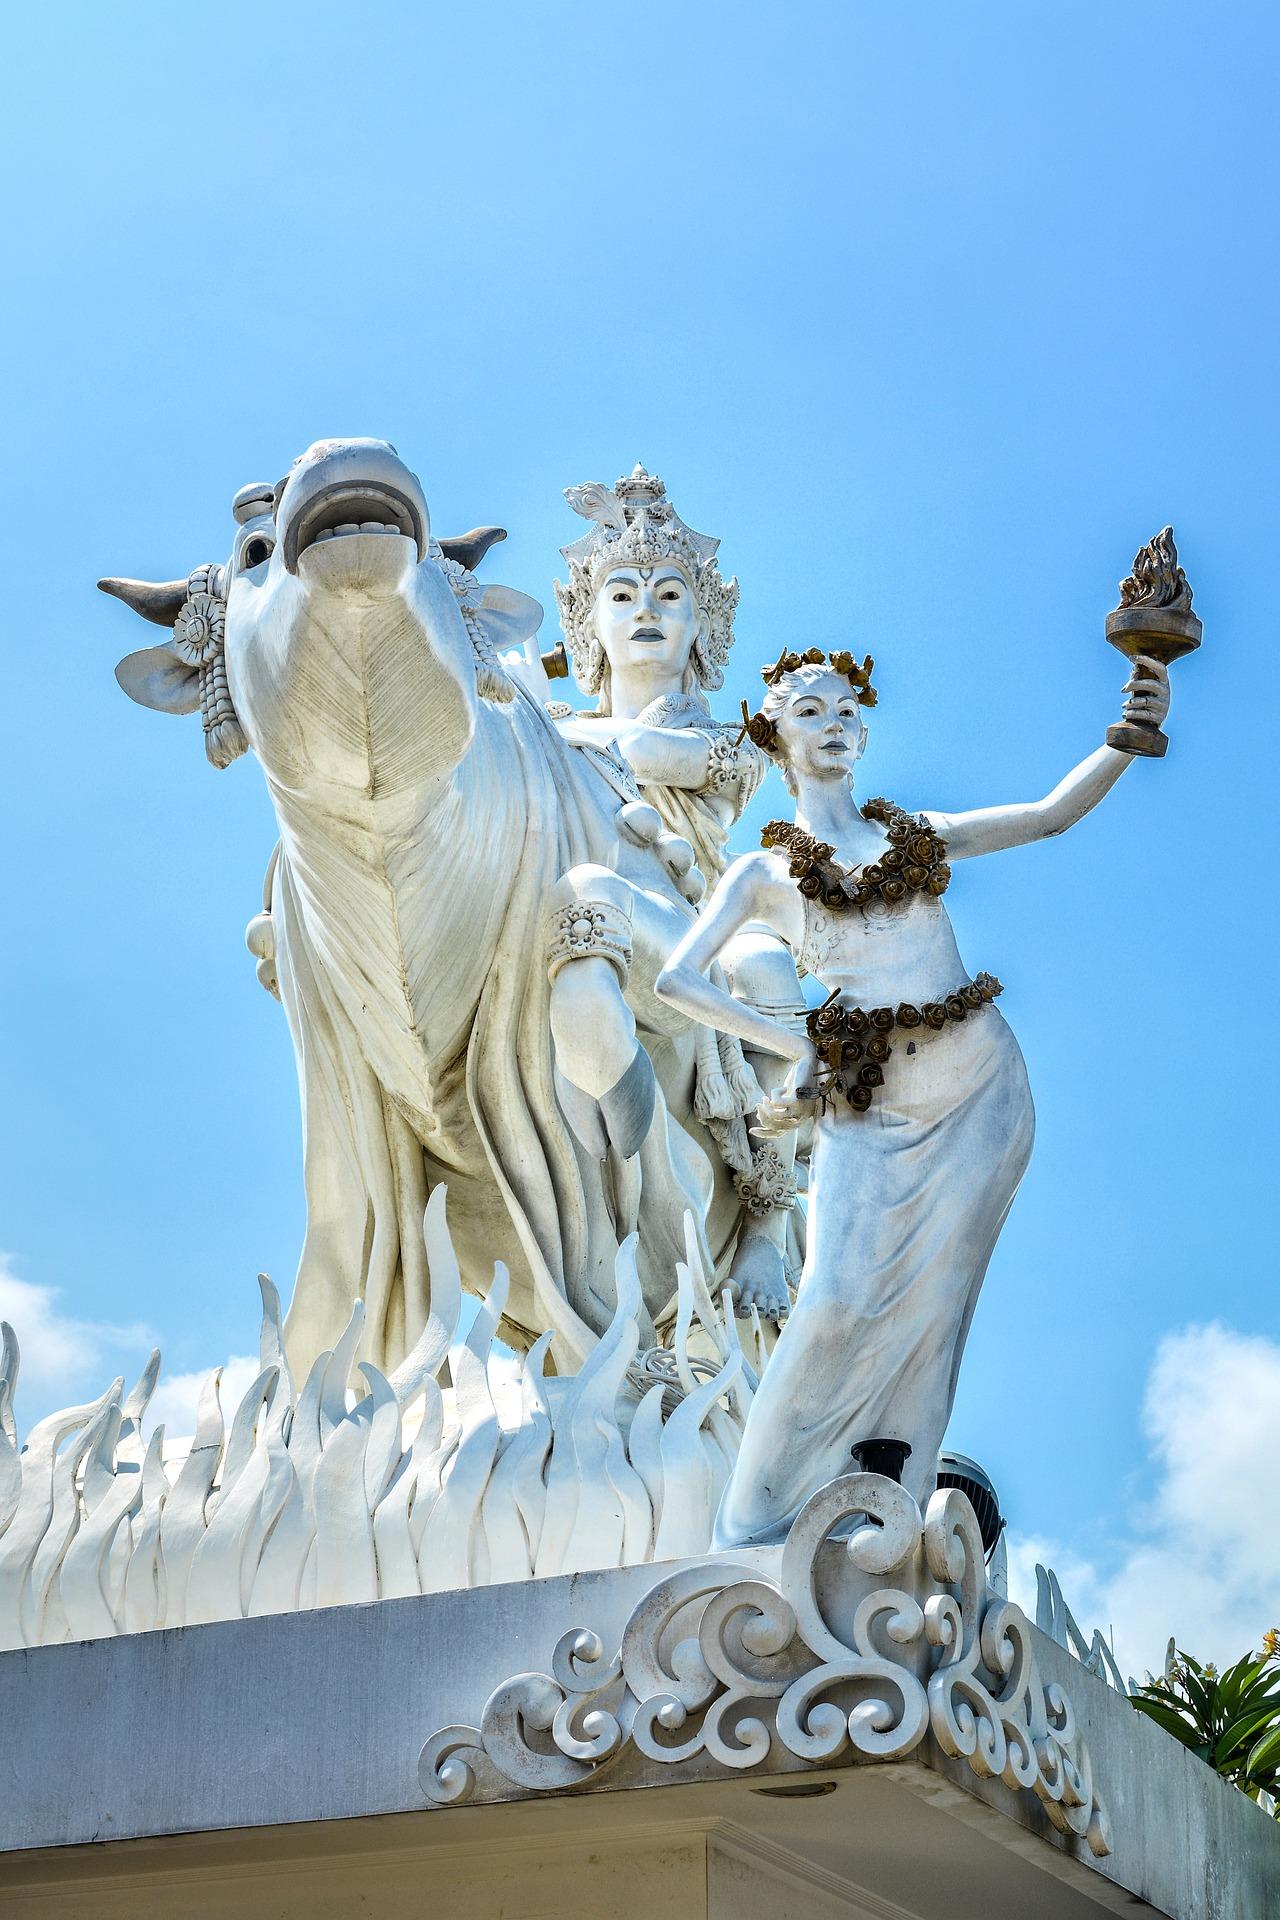 Imiona żeńskie hinduskich bogiń